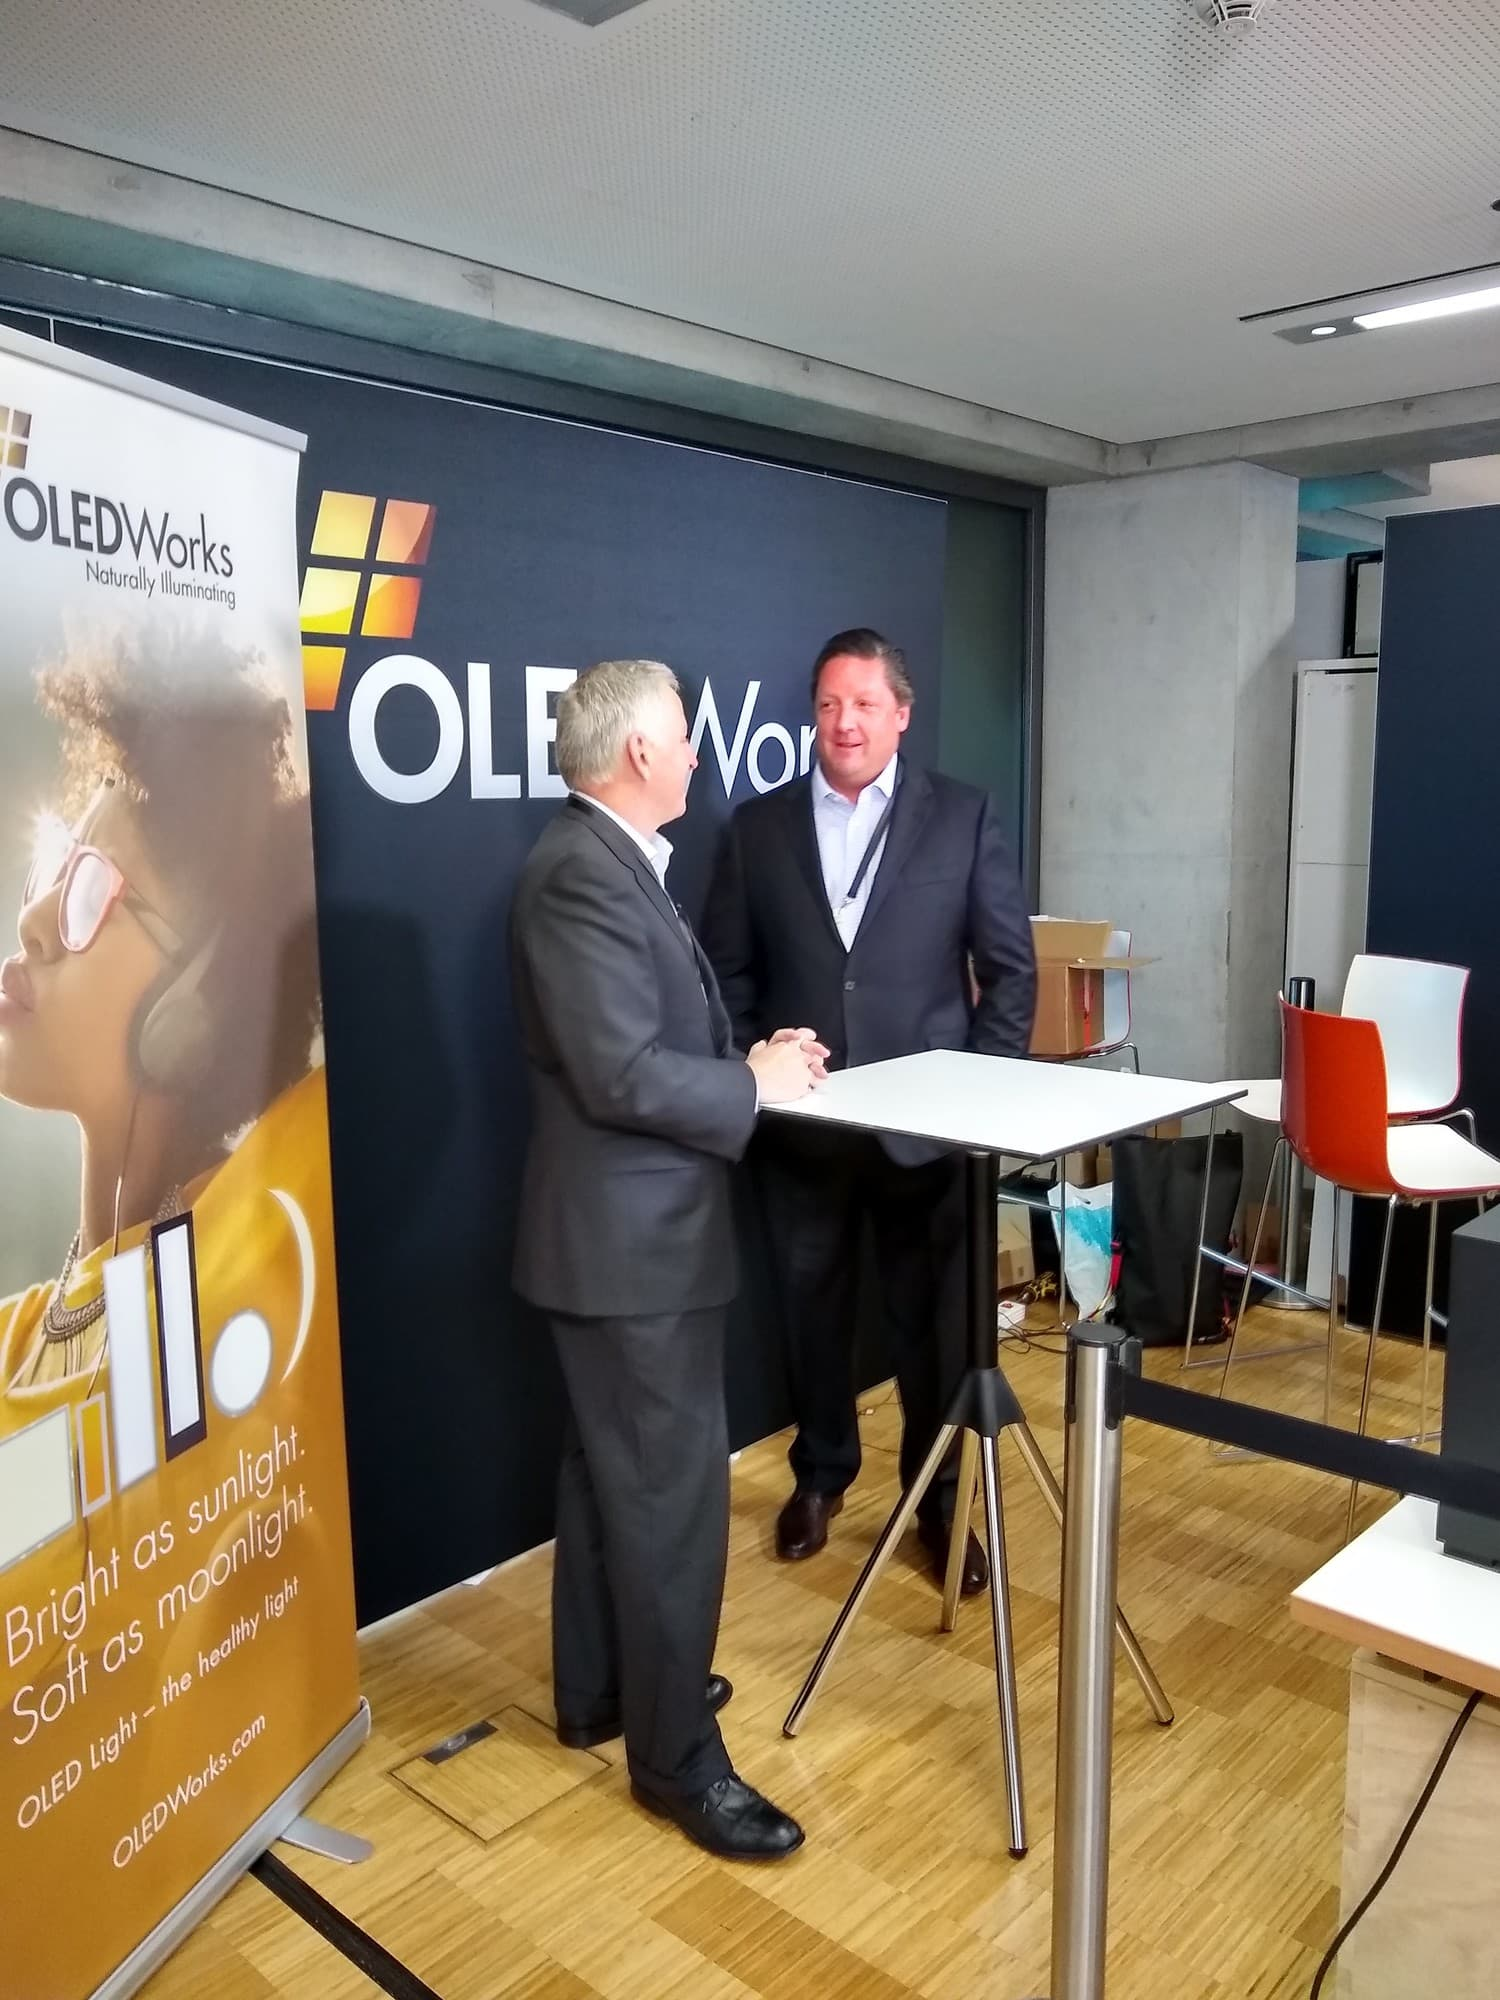 CEO Dave Dejoy and CRO John Holland, OLEDWorks